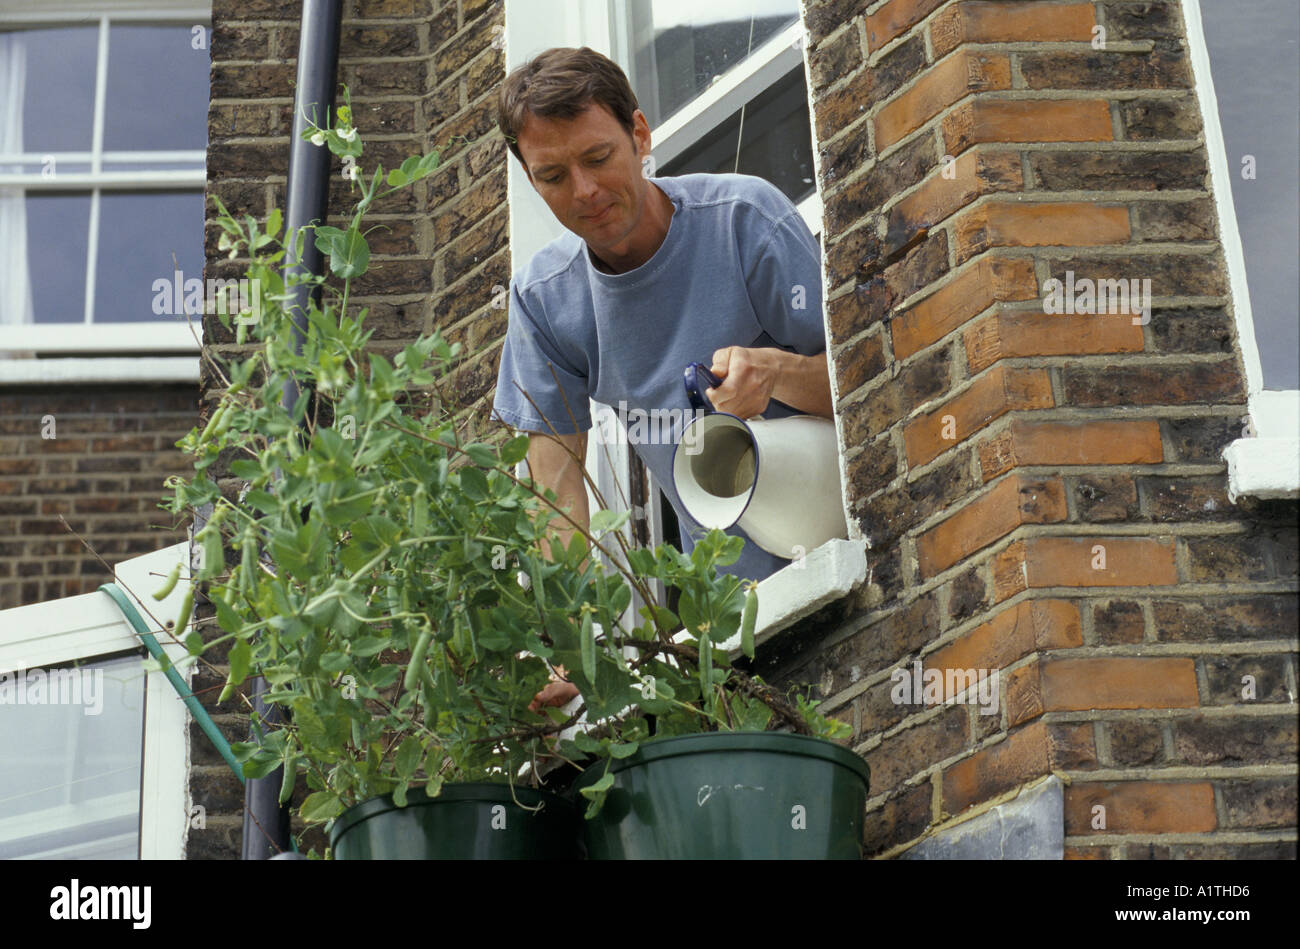 Watering plants - Stock Image